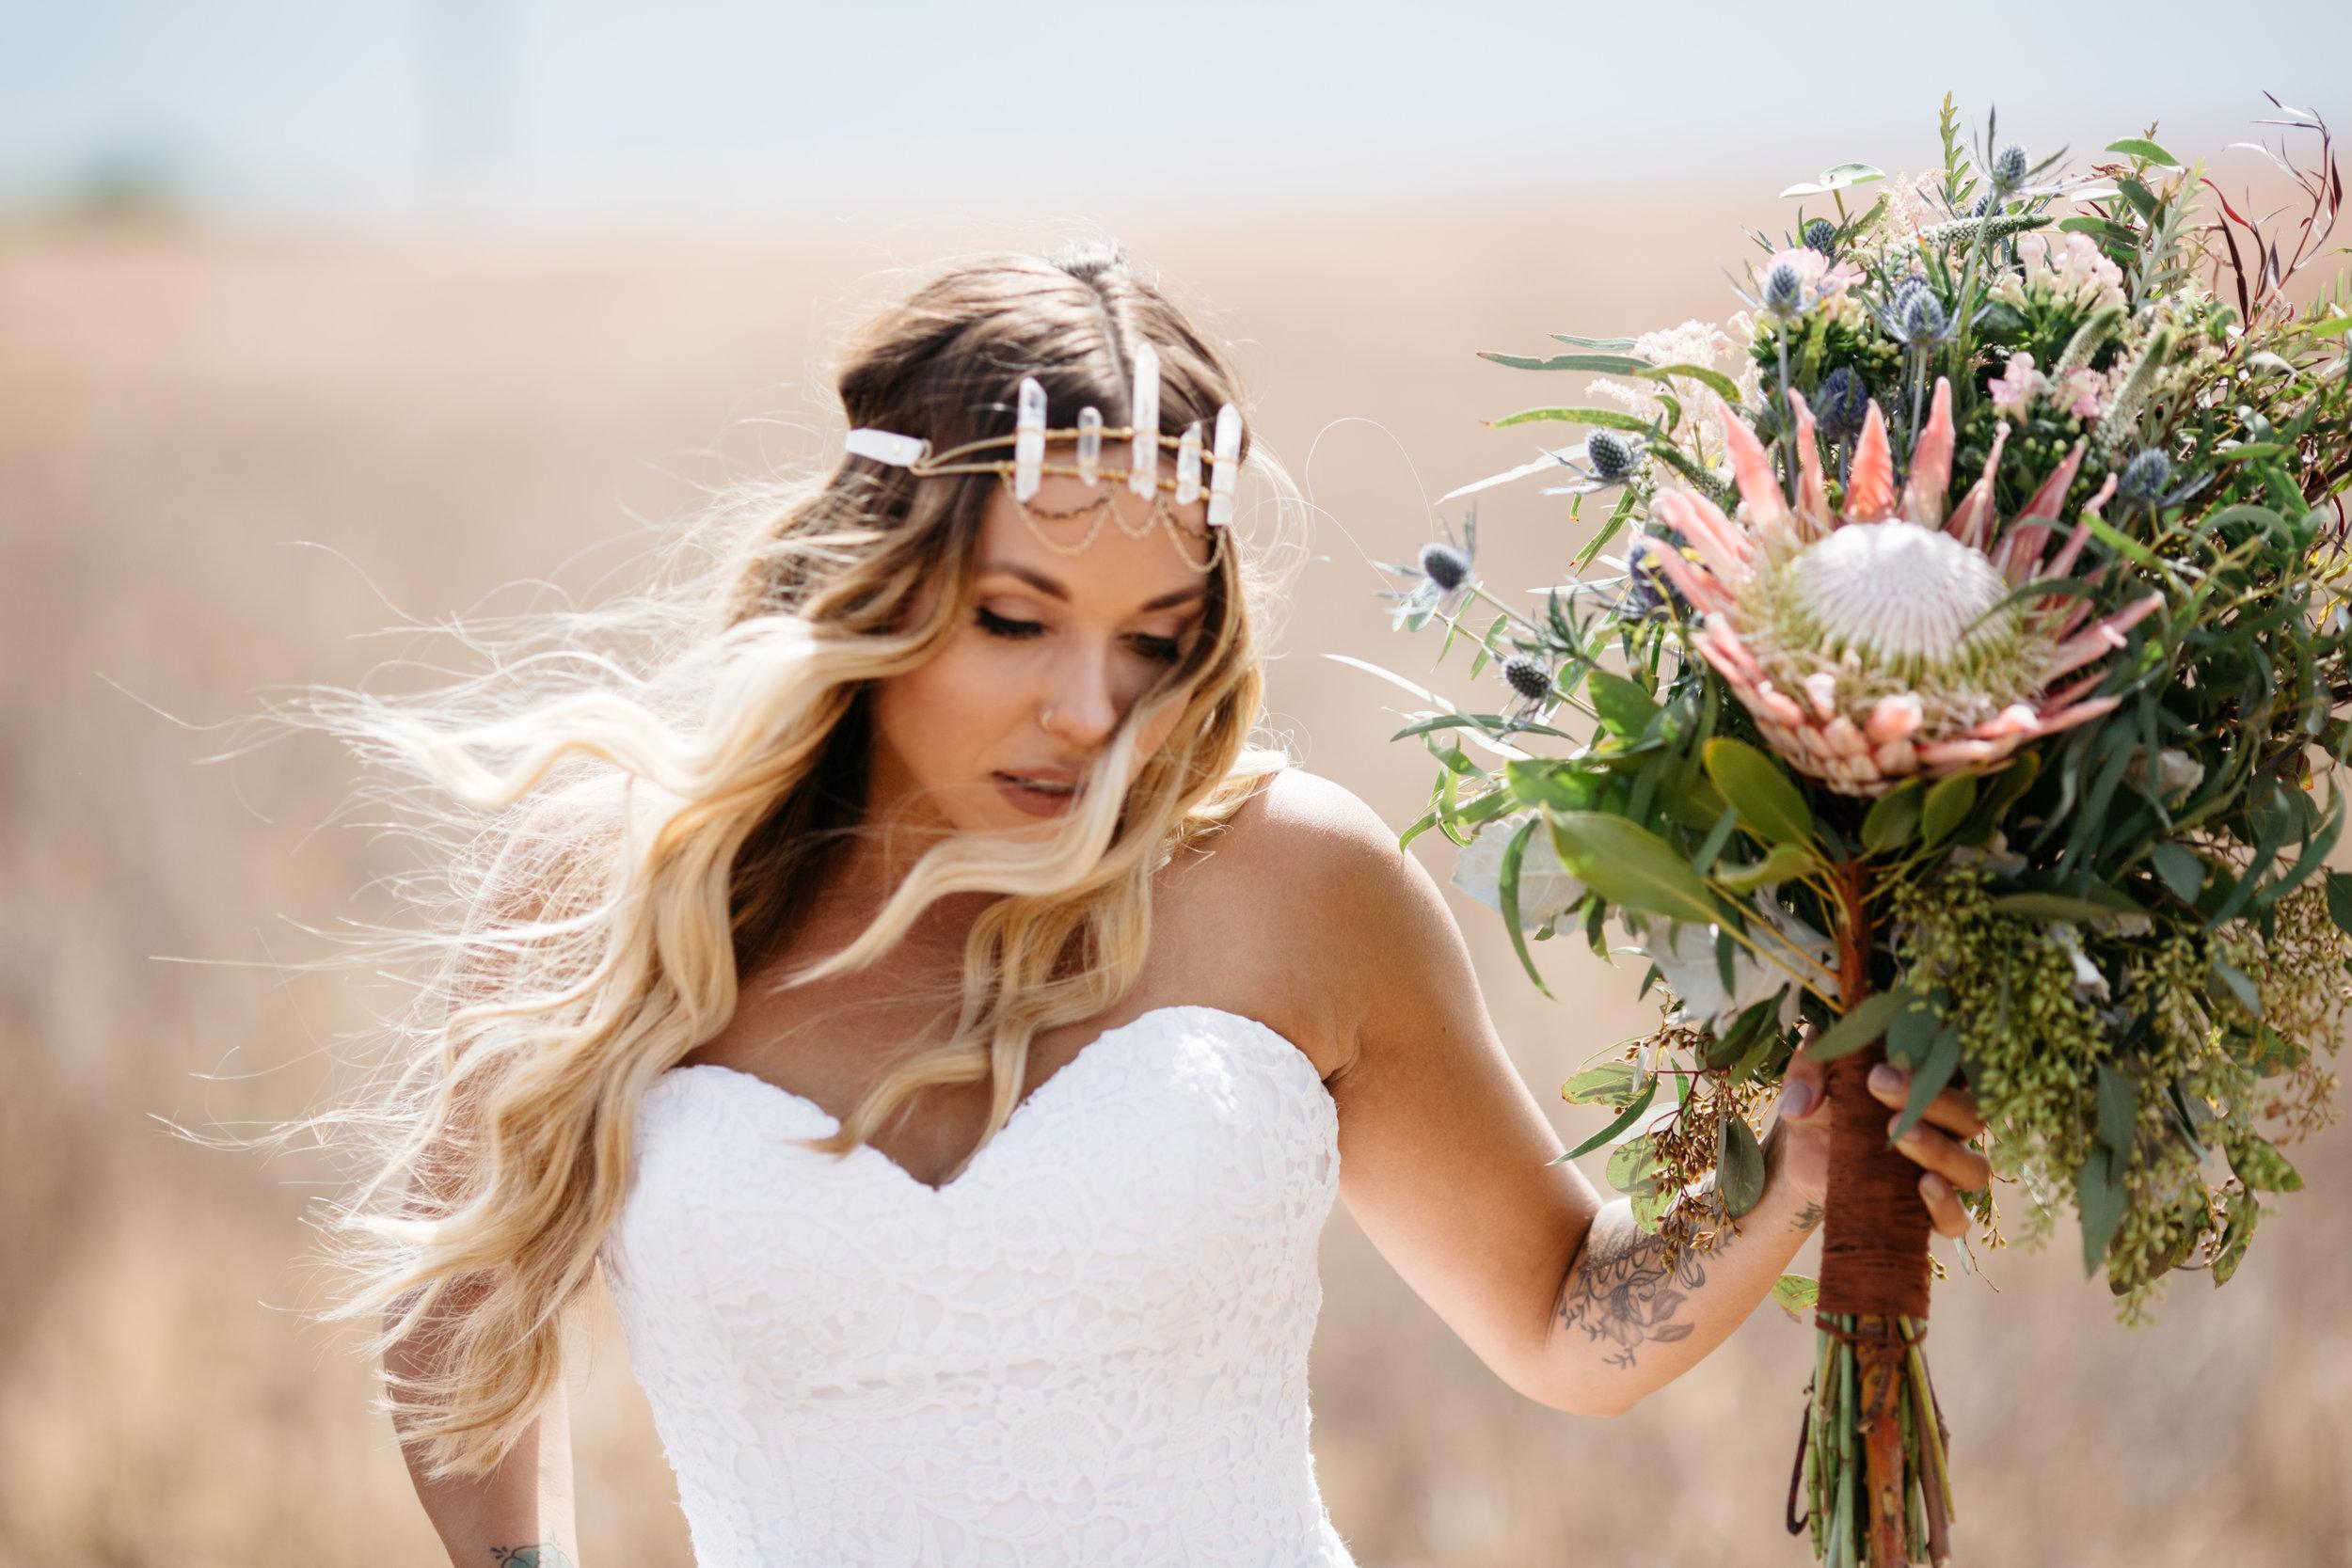 colorado-springs-wedding-photographer-19.jpg